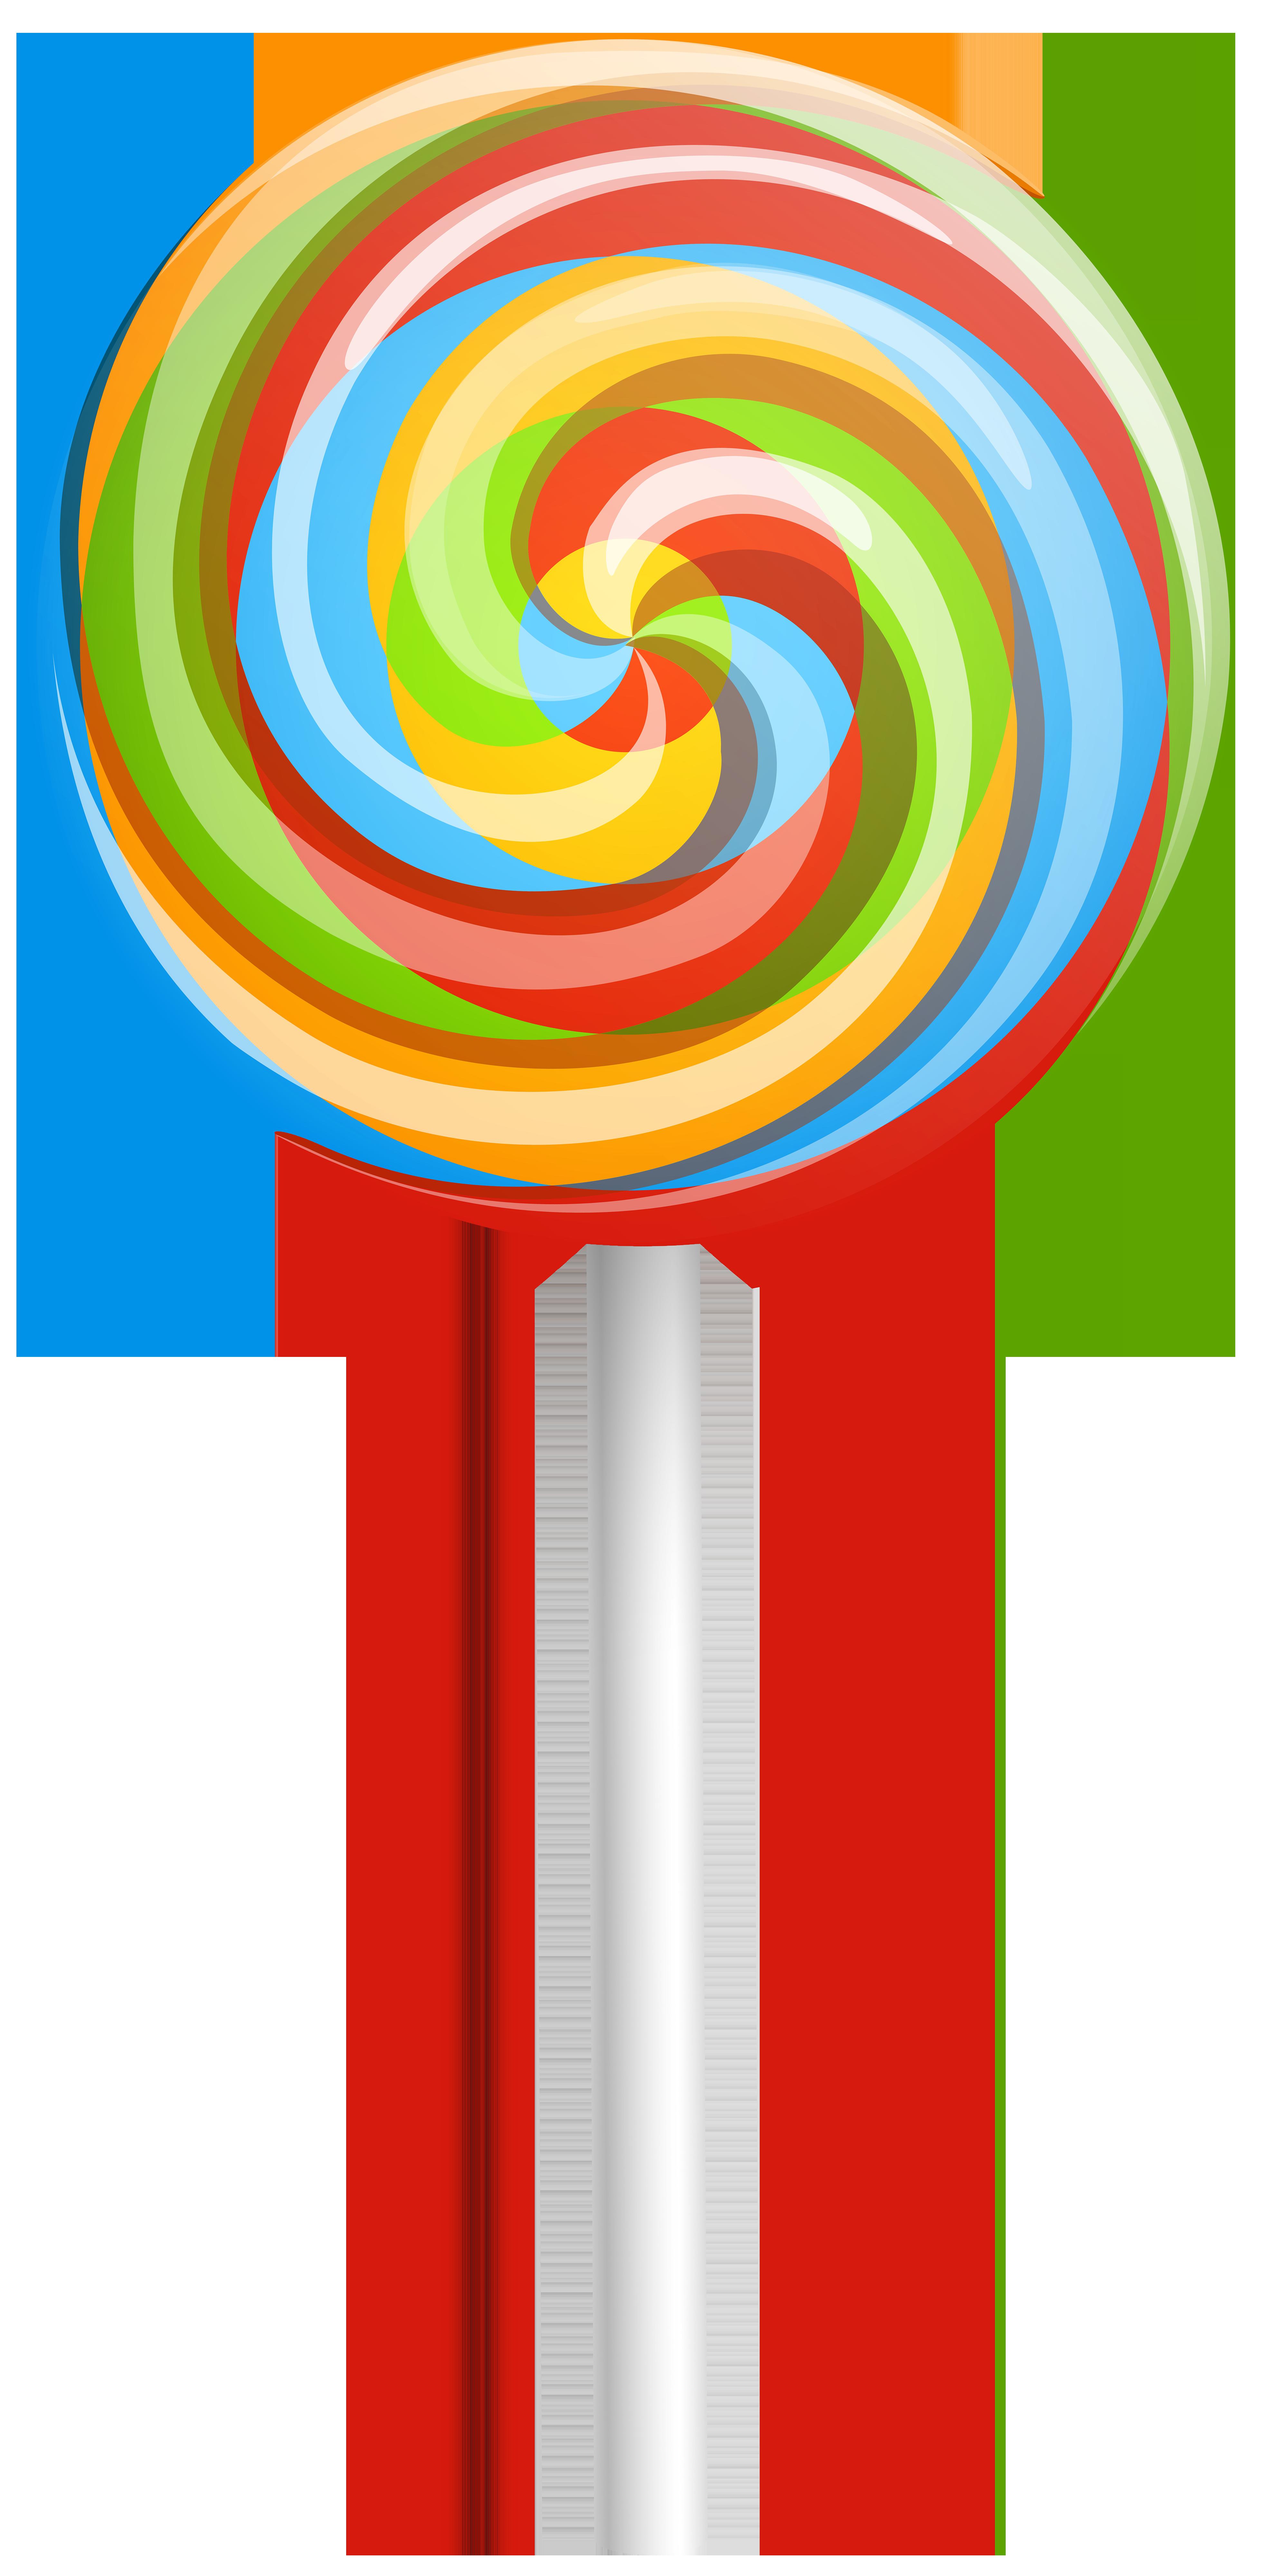 Rainbow Swirl Lollipop PNG Clip Art Image.